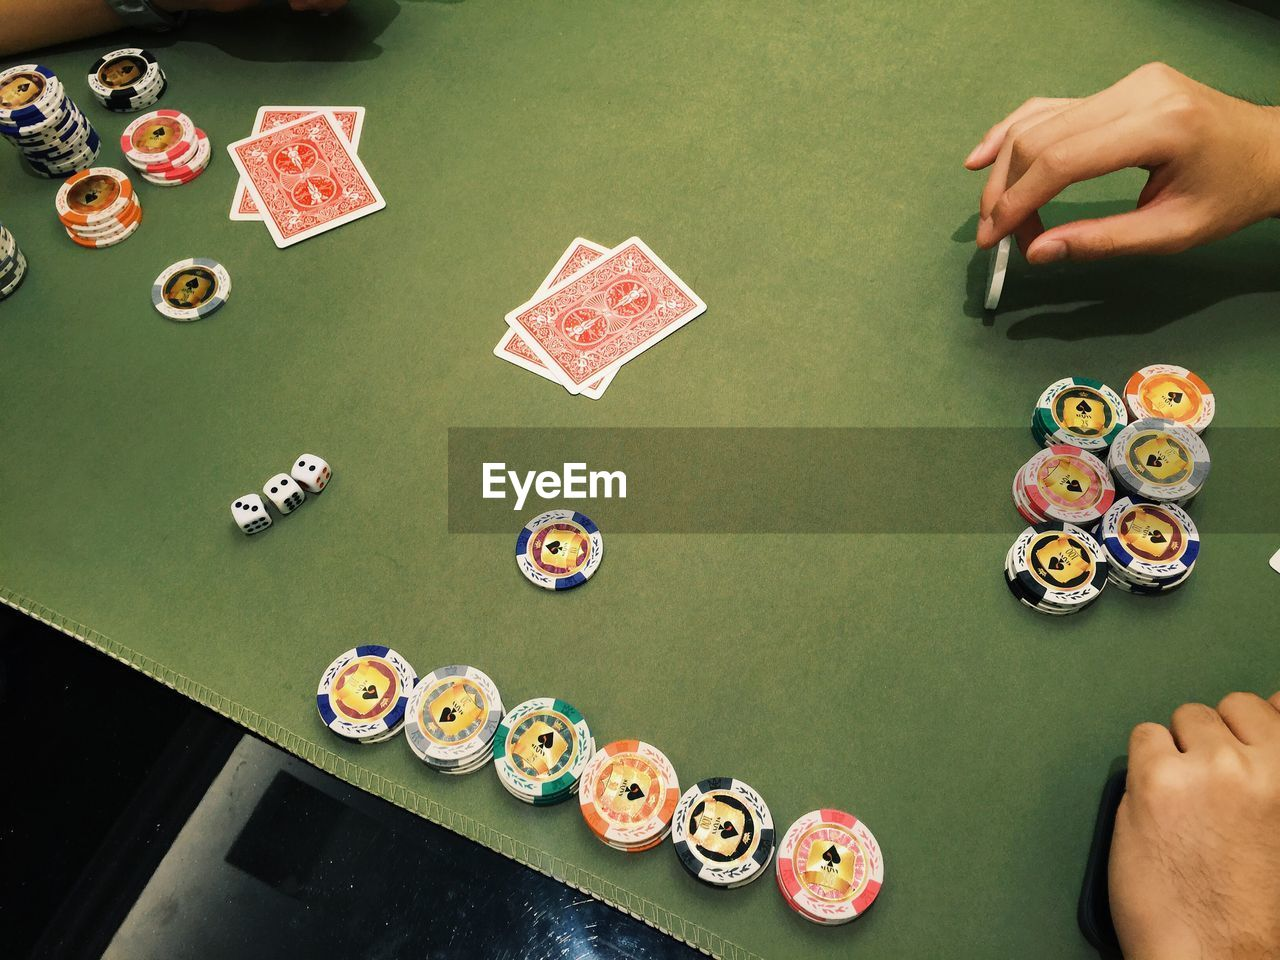 Man At Table Playing Poker